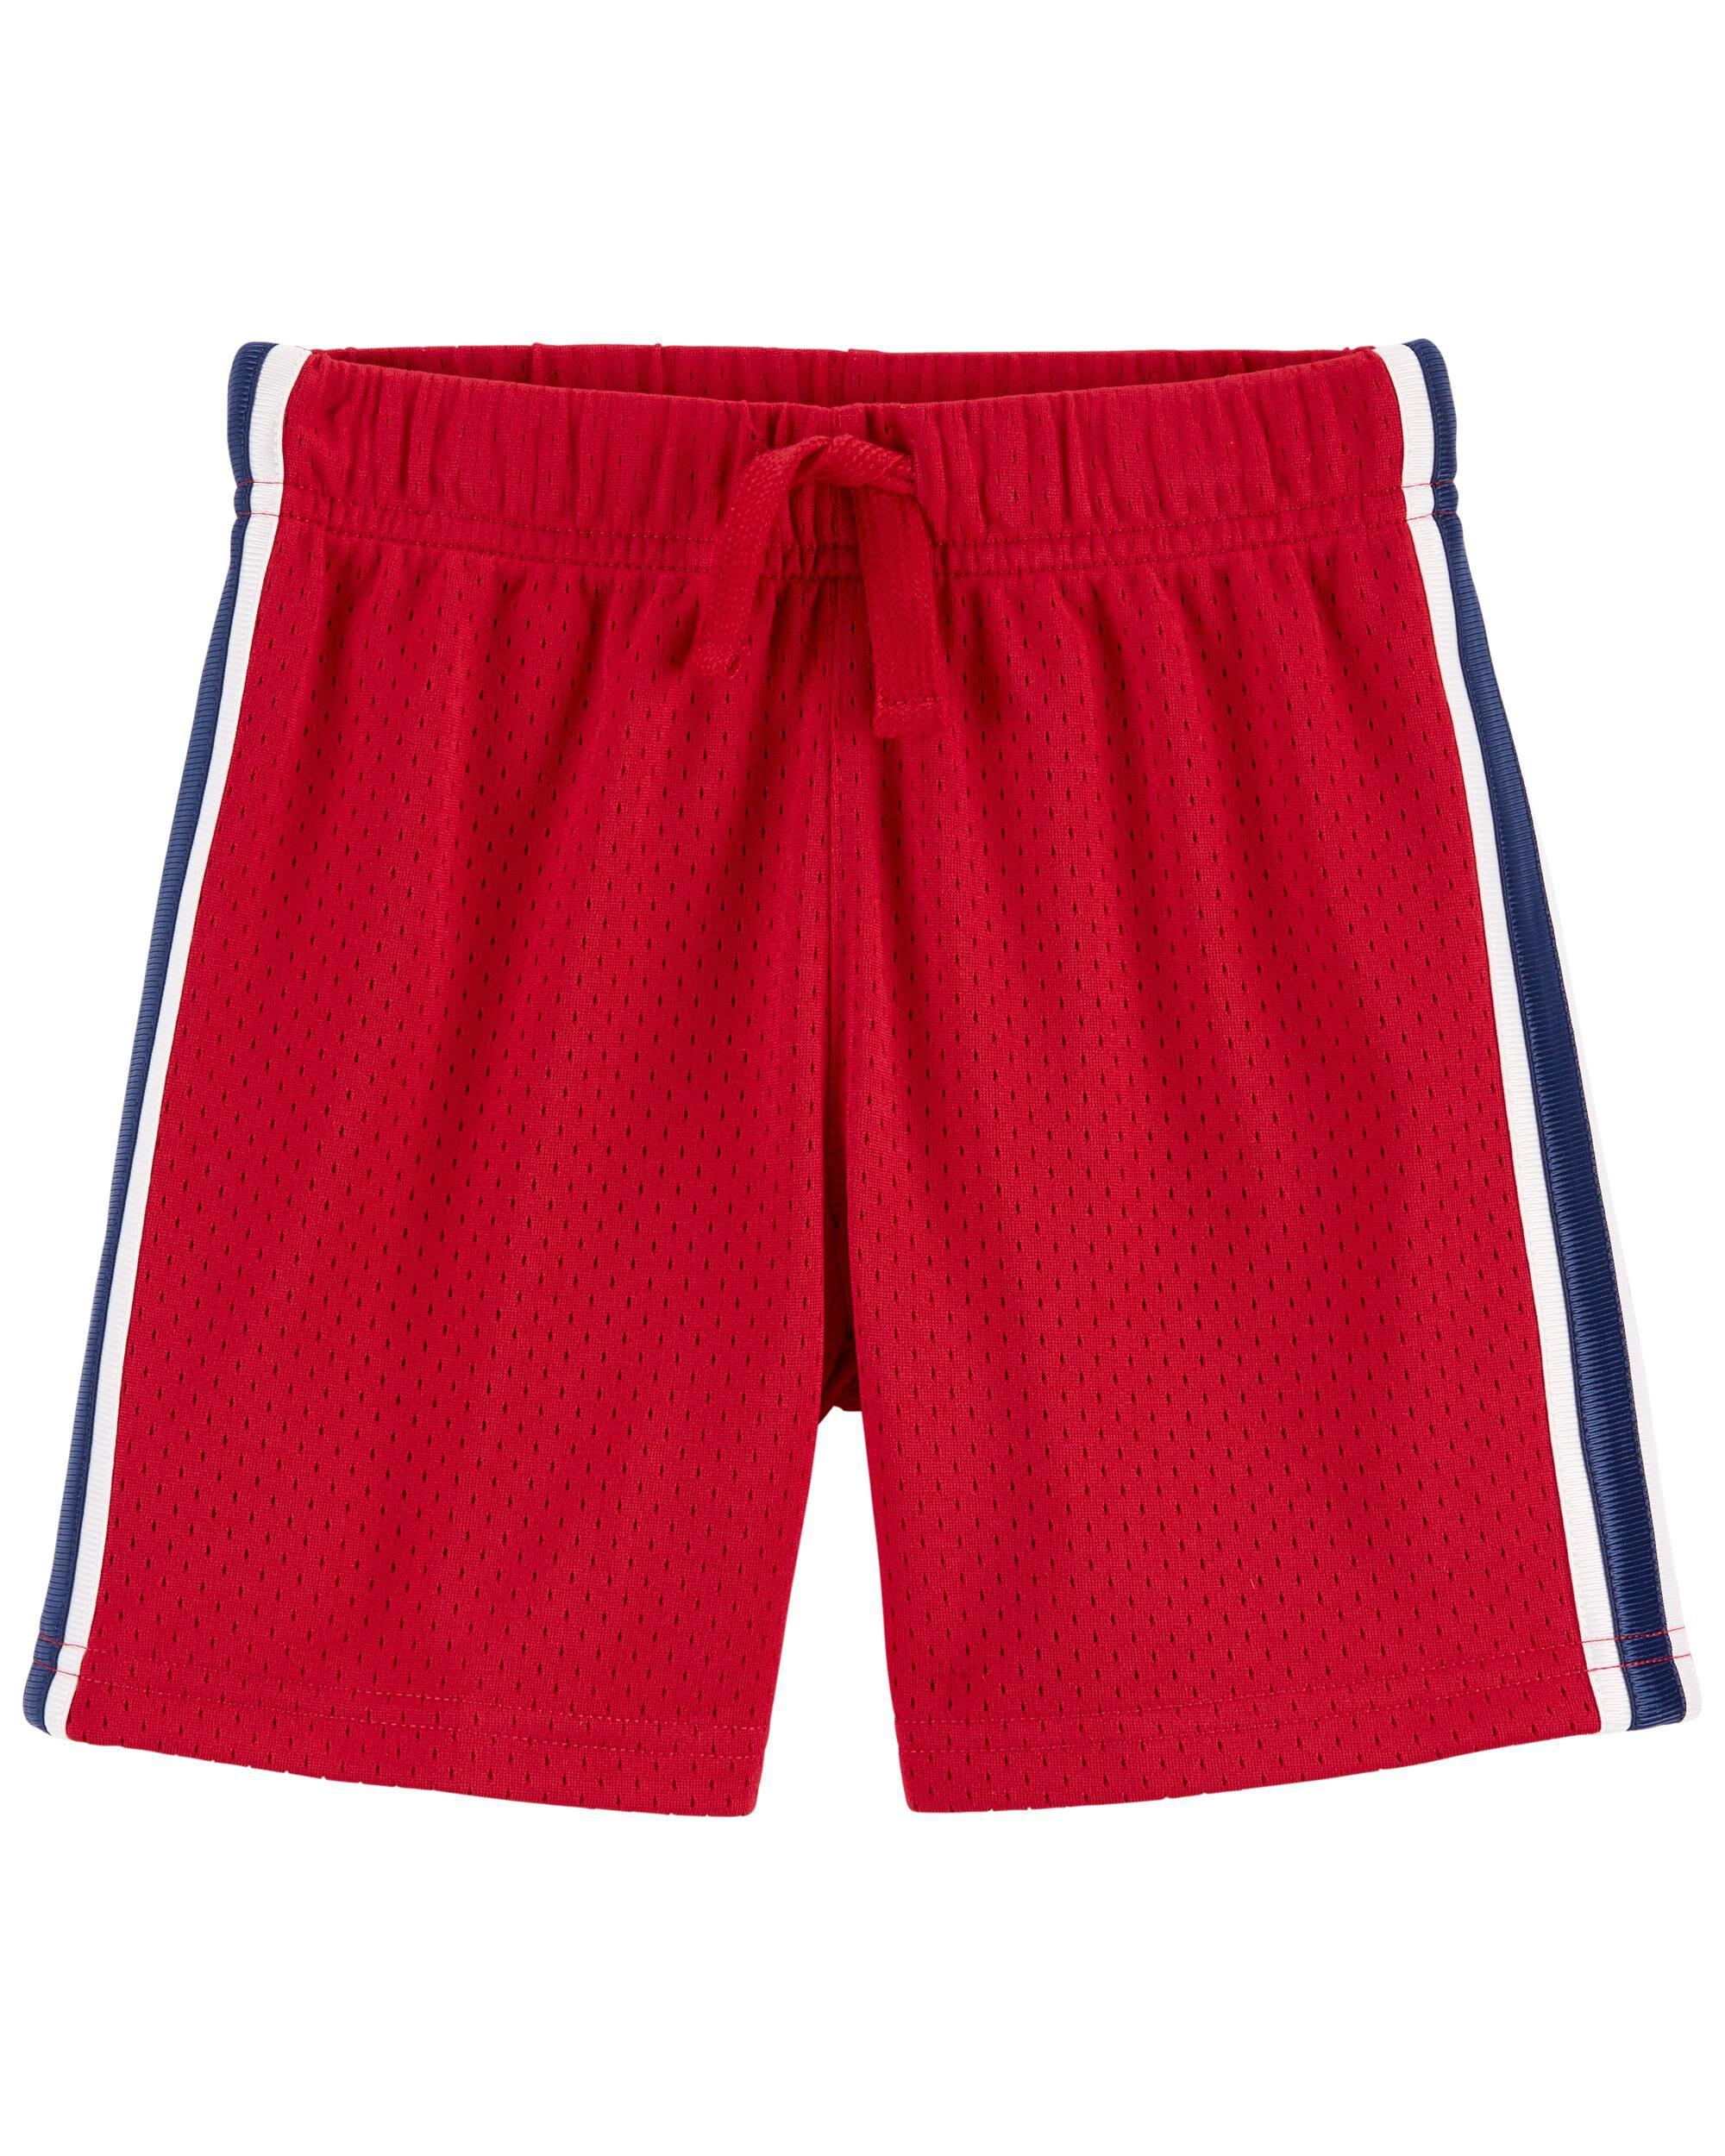 Carters Active Mesh Shorts